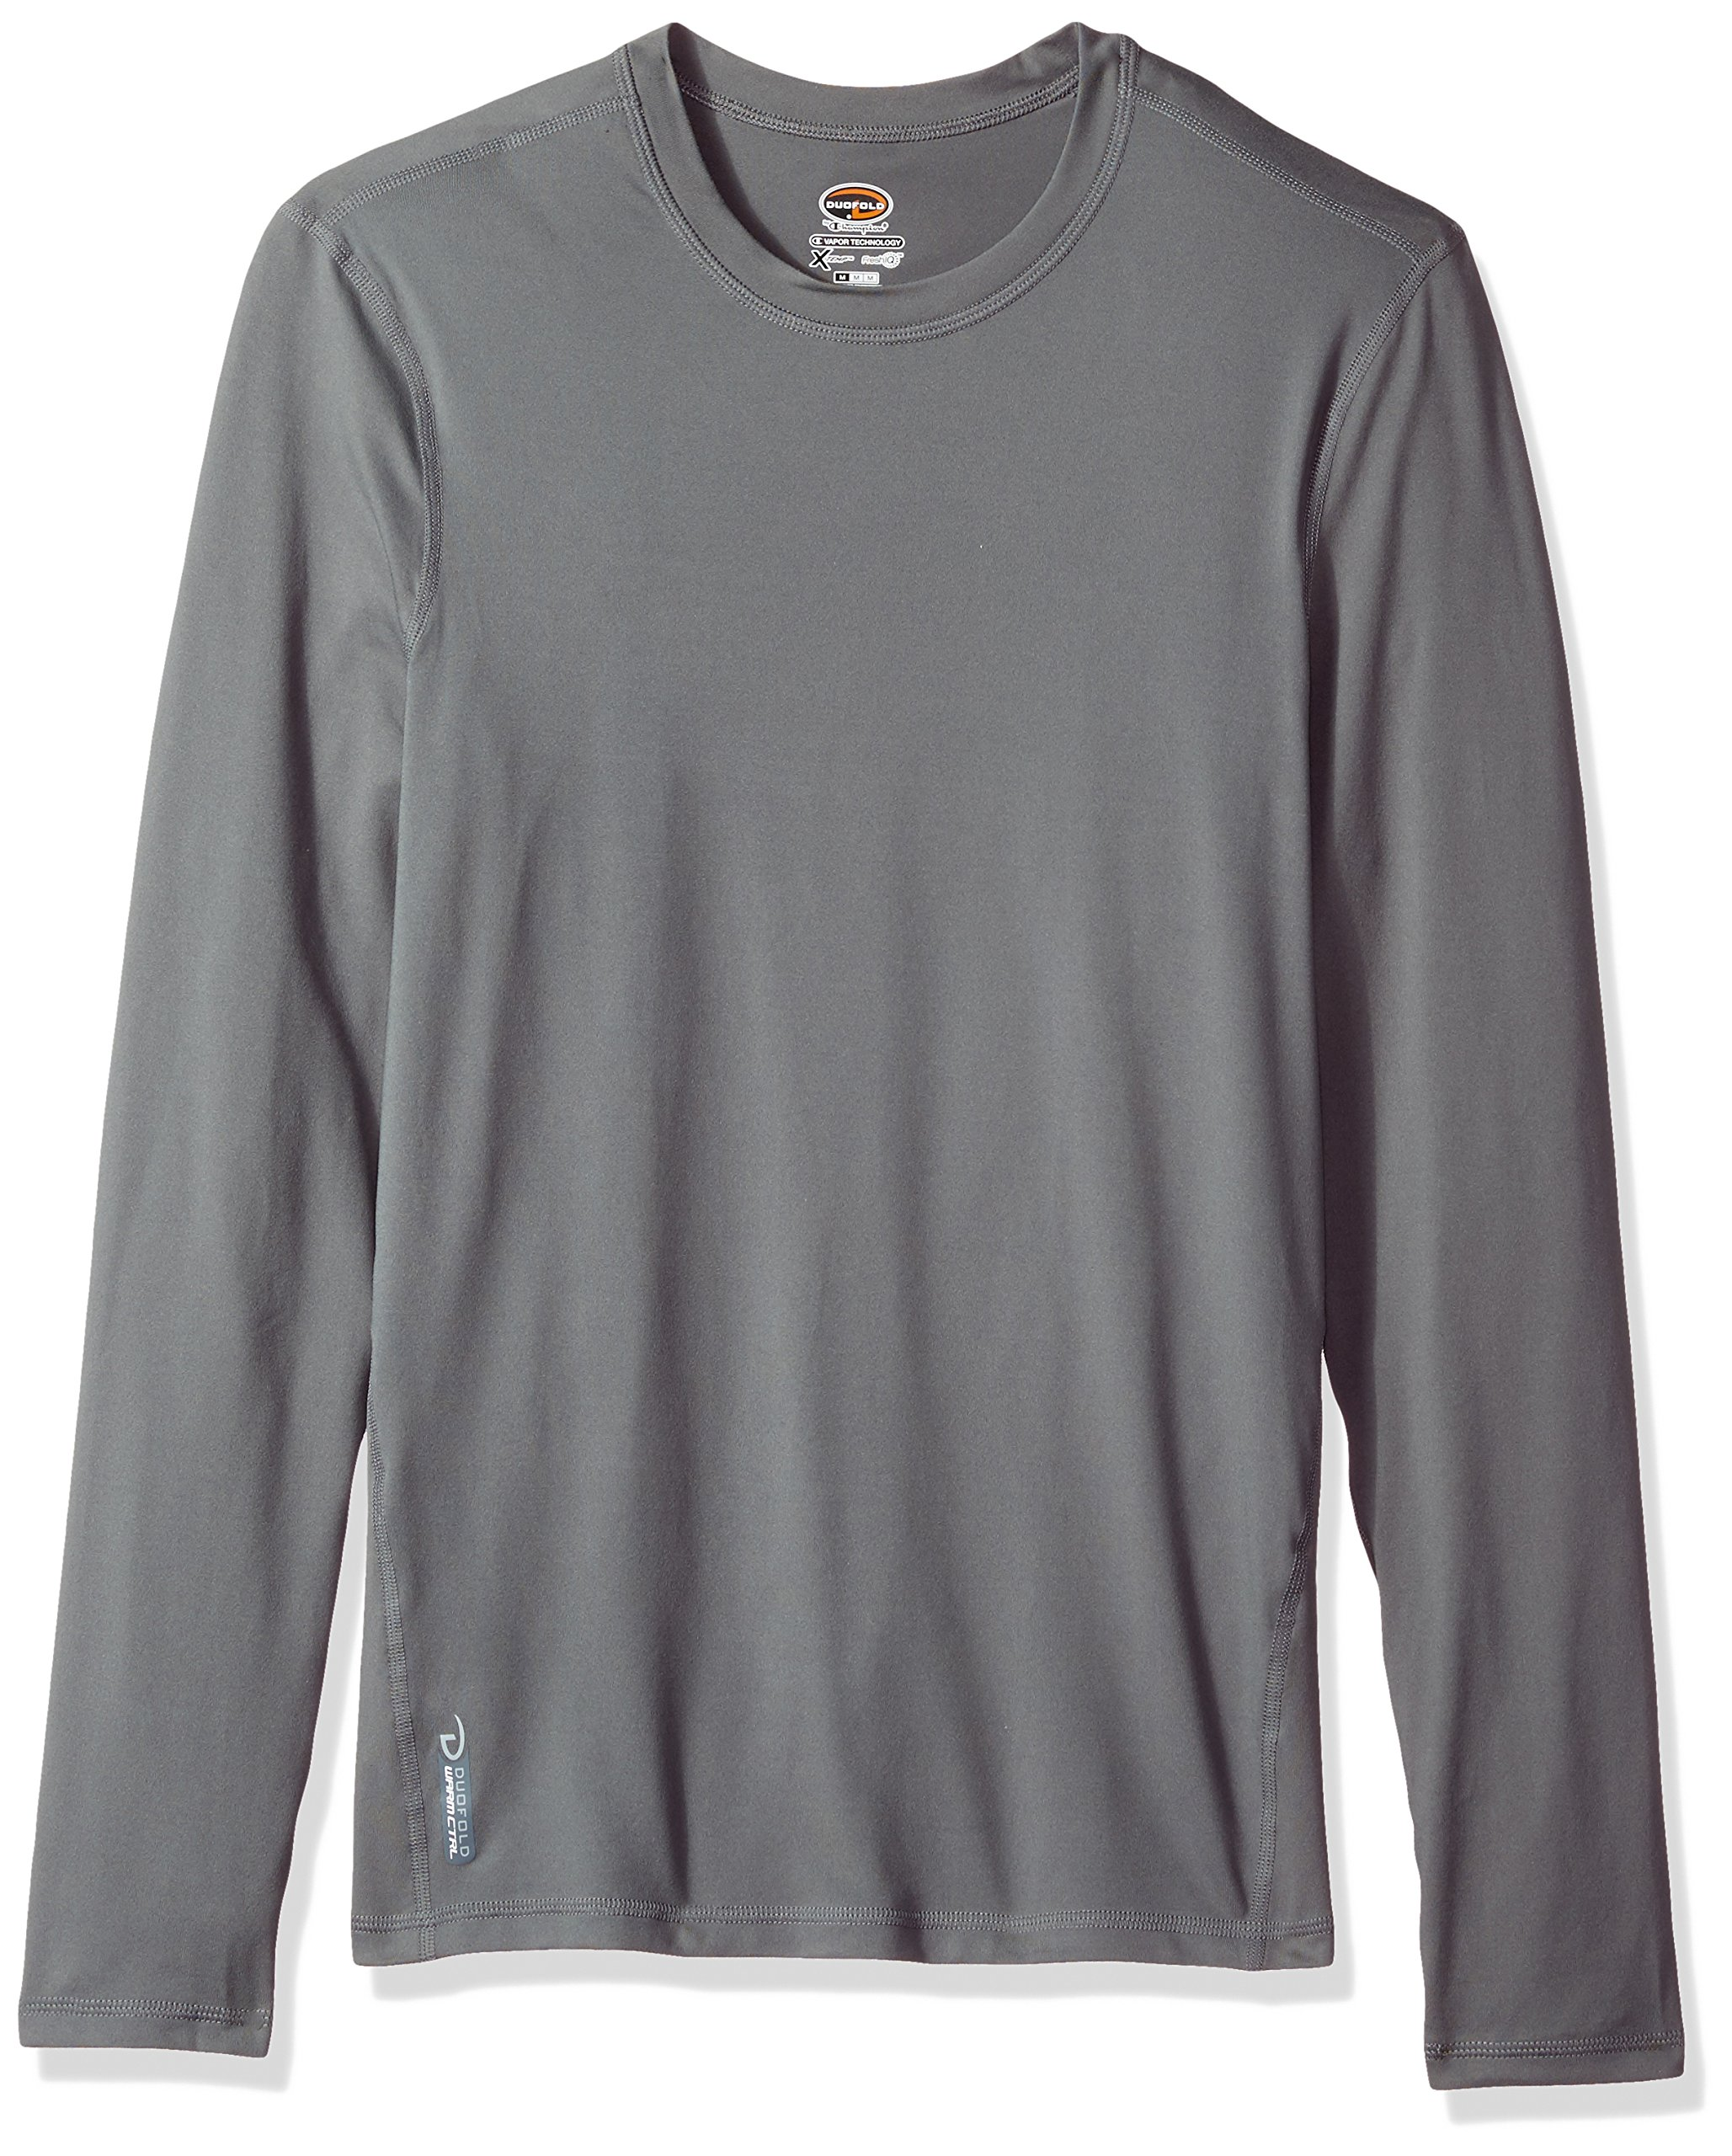 Duofold Men's Flex Weight Thermal Shirt, Thundering Gray, Medium